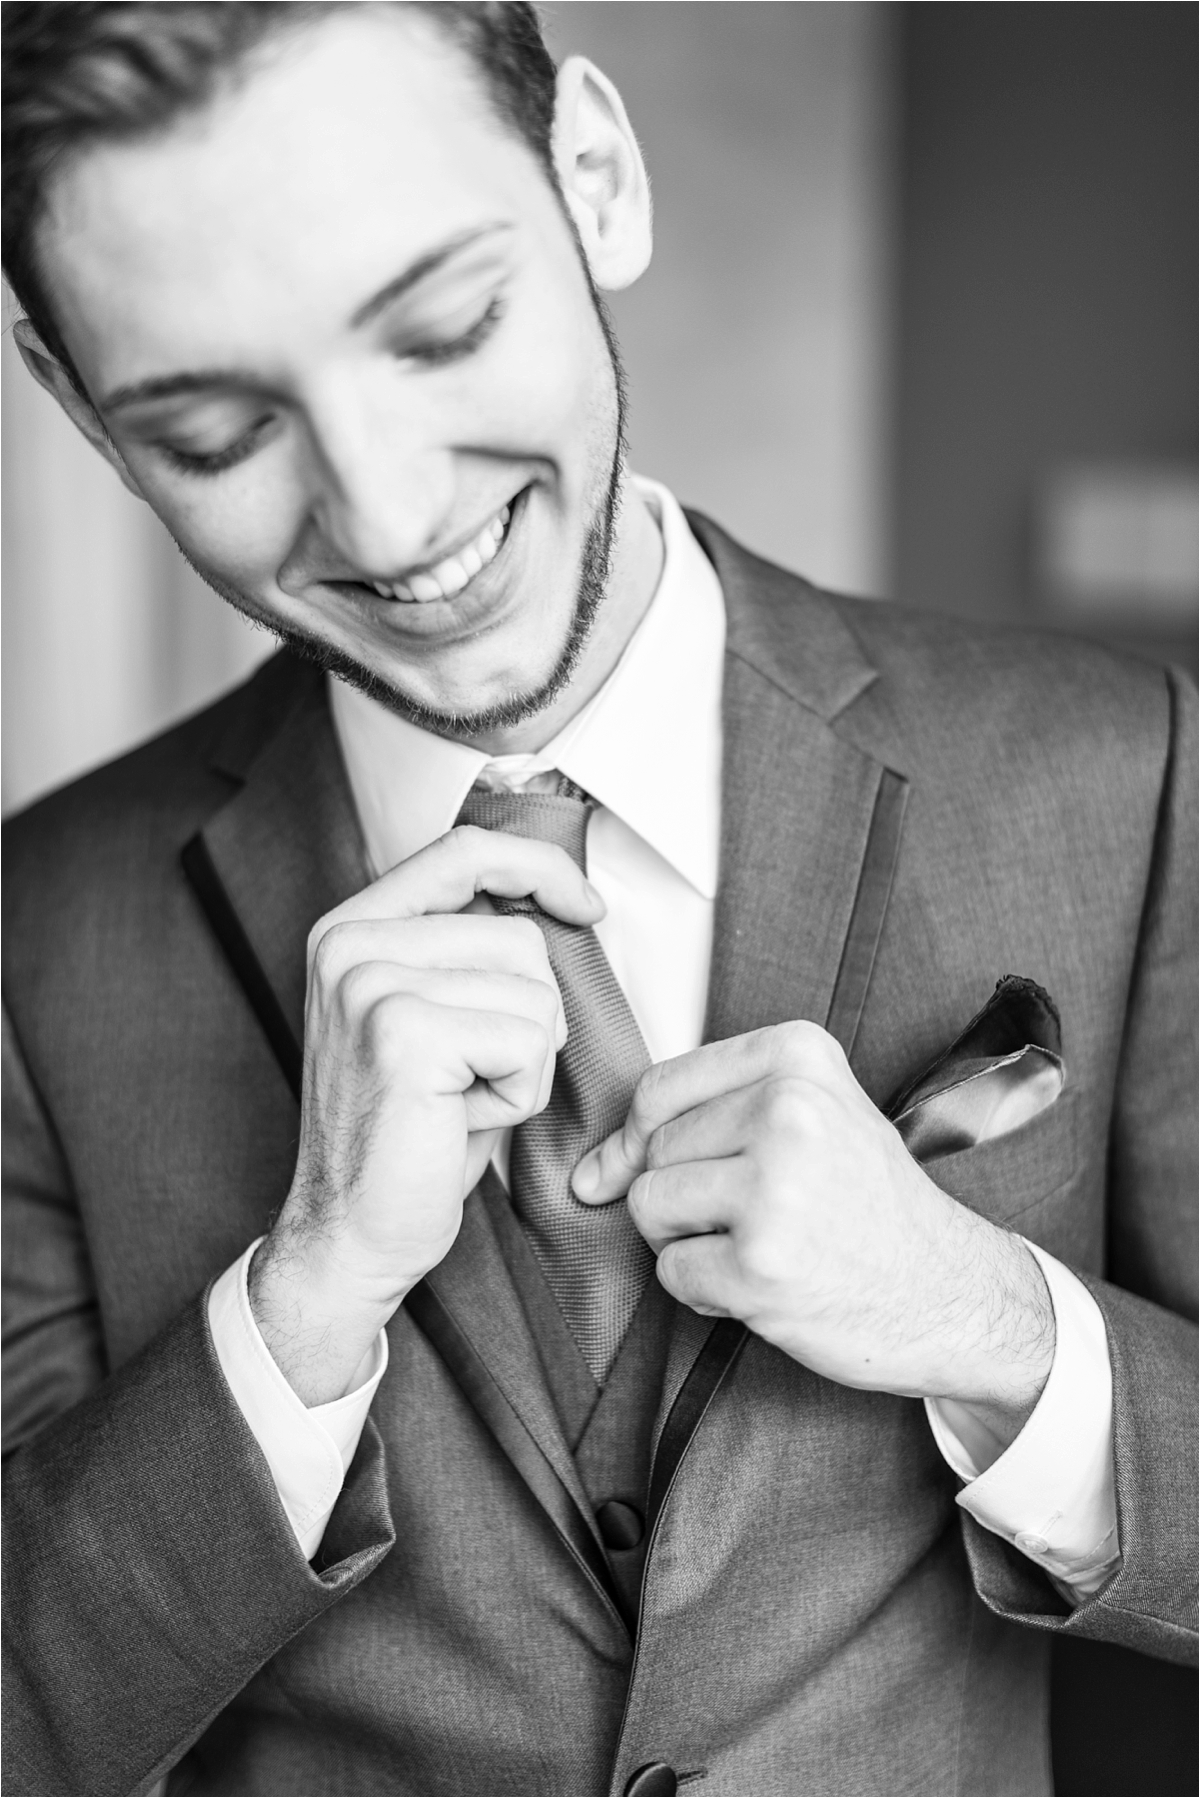 groom-tie-wedding-alabama-photographer-getting-ready